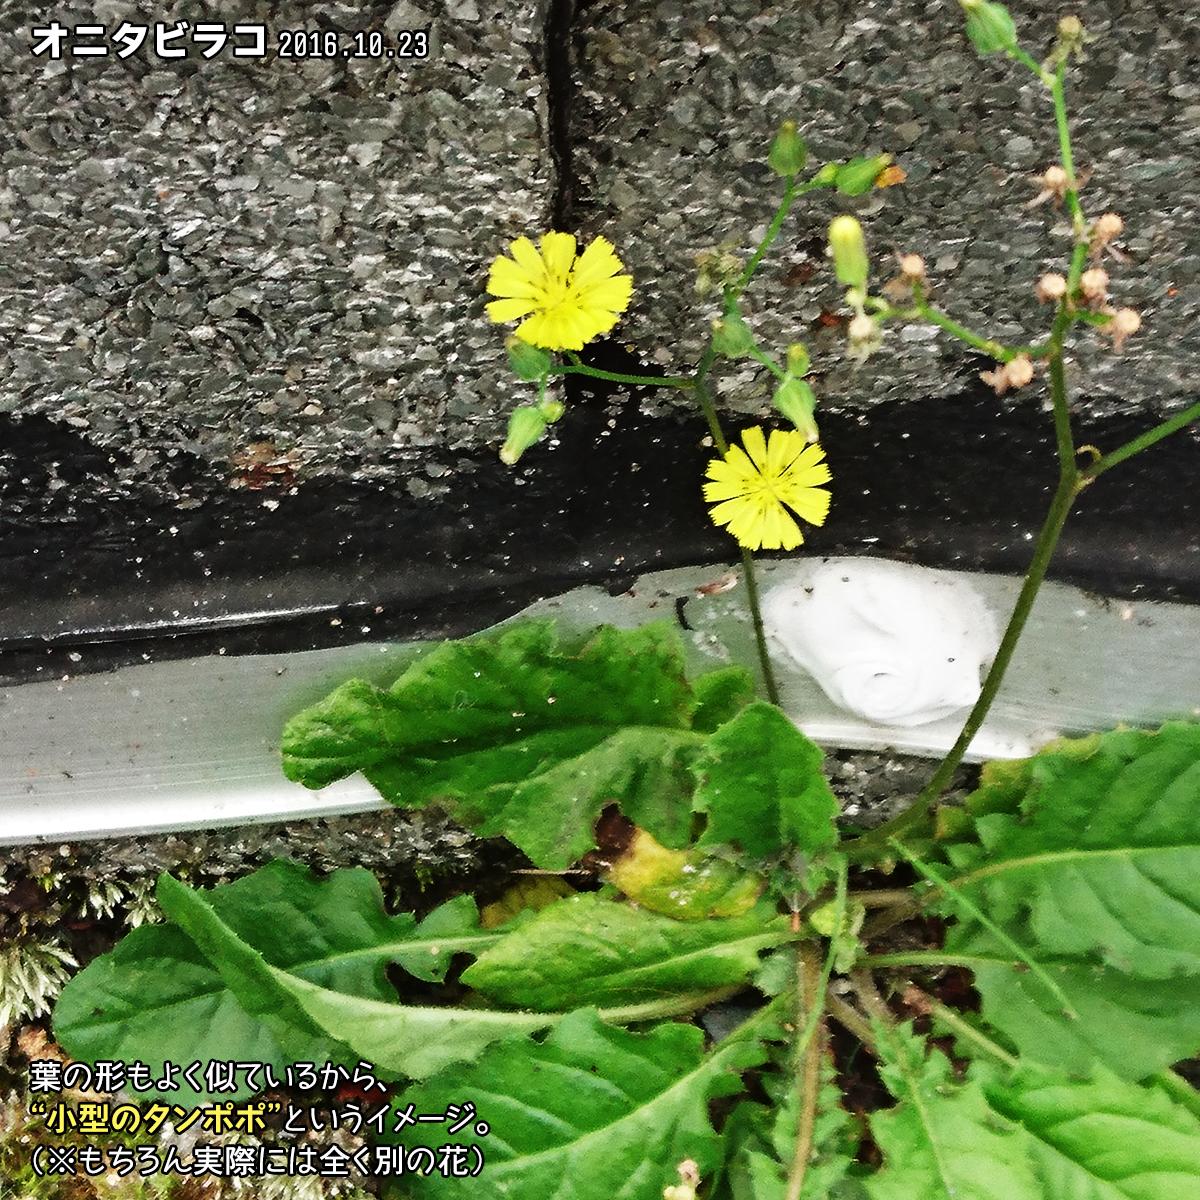 DSC_0307_2.jpg